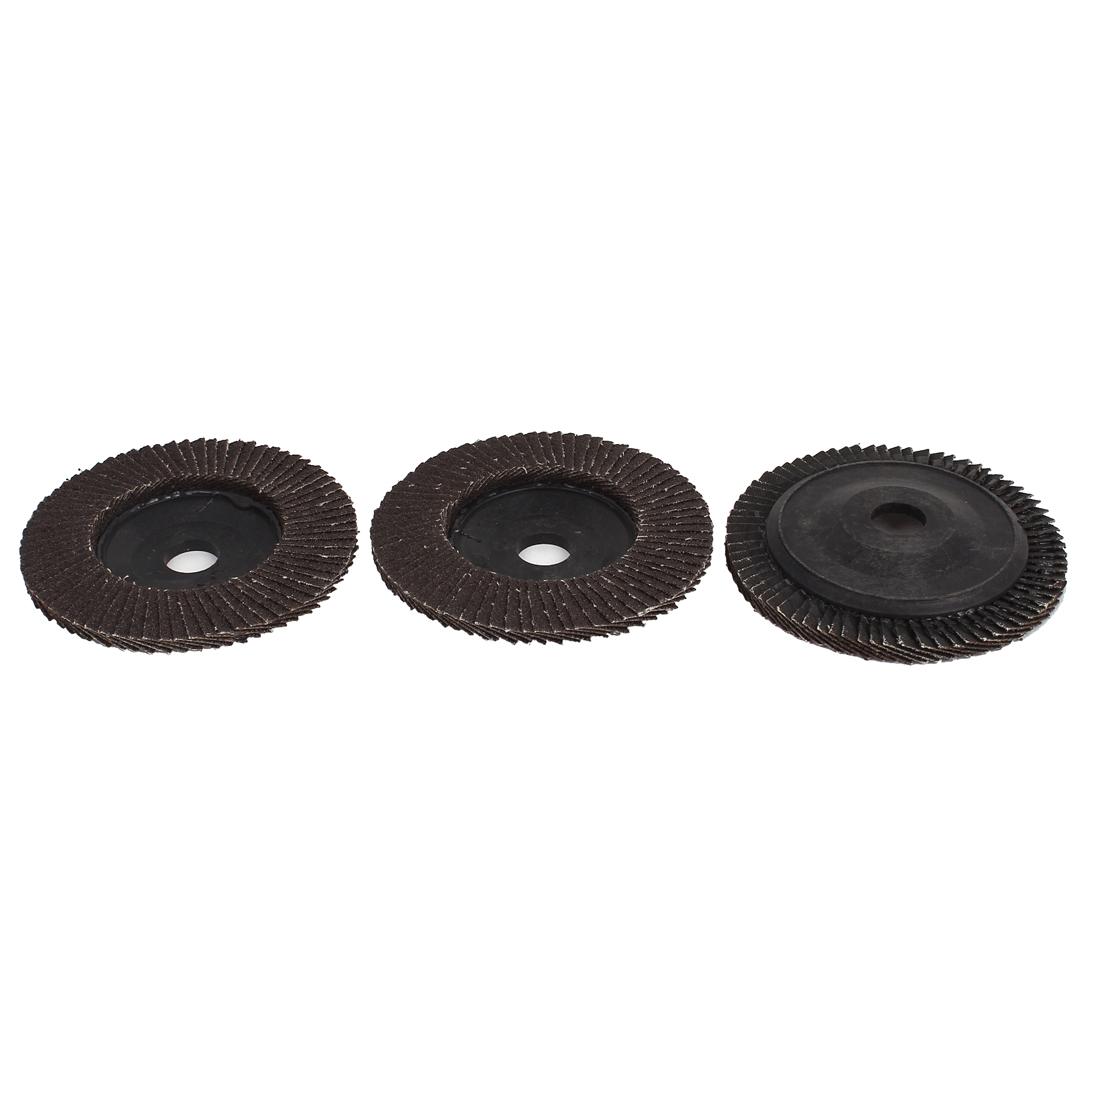 "3pcs 100mm 4"" Dia 16mm Bore 60 Grit Flap Sanding Discs Polishing Buffing Wheels"